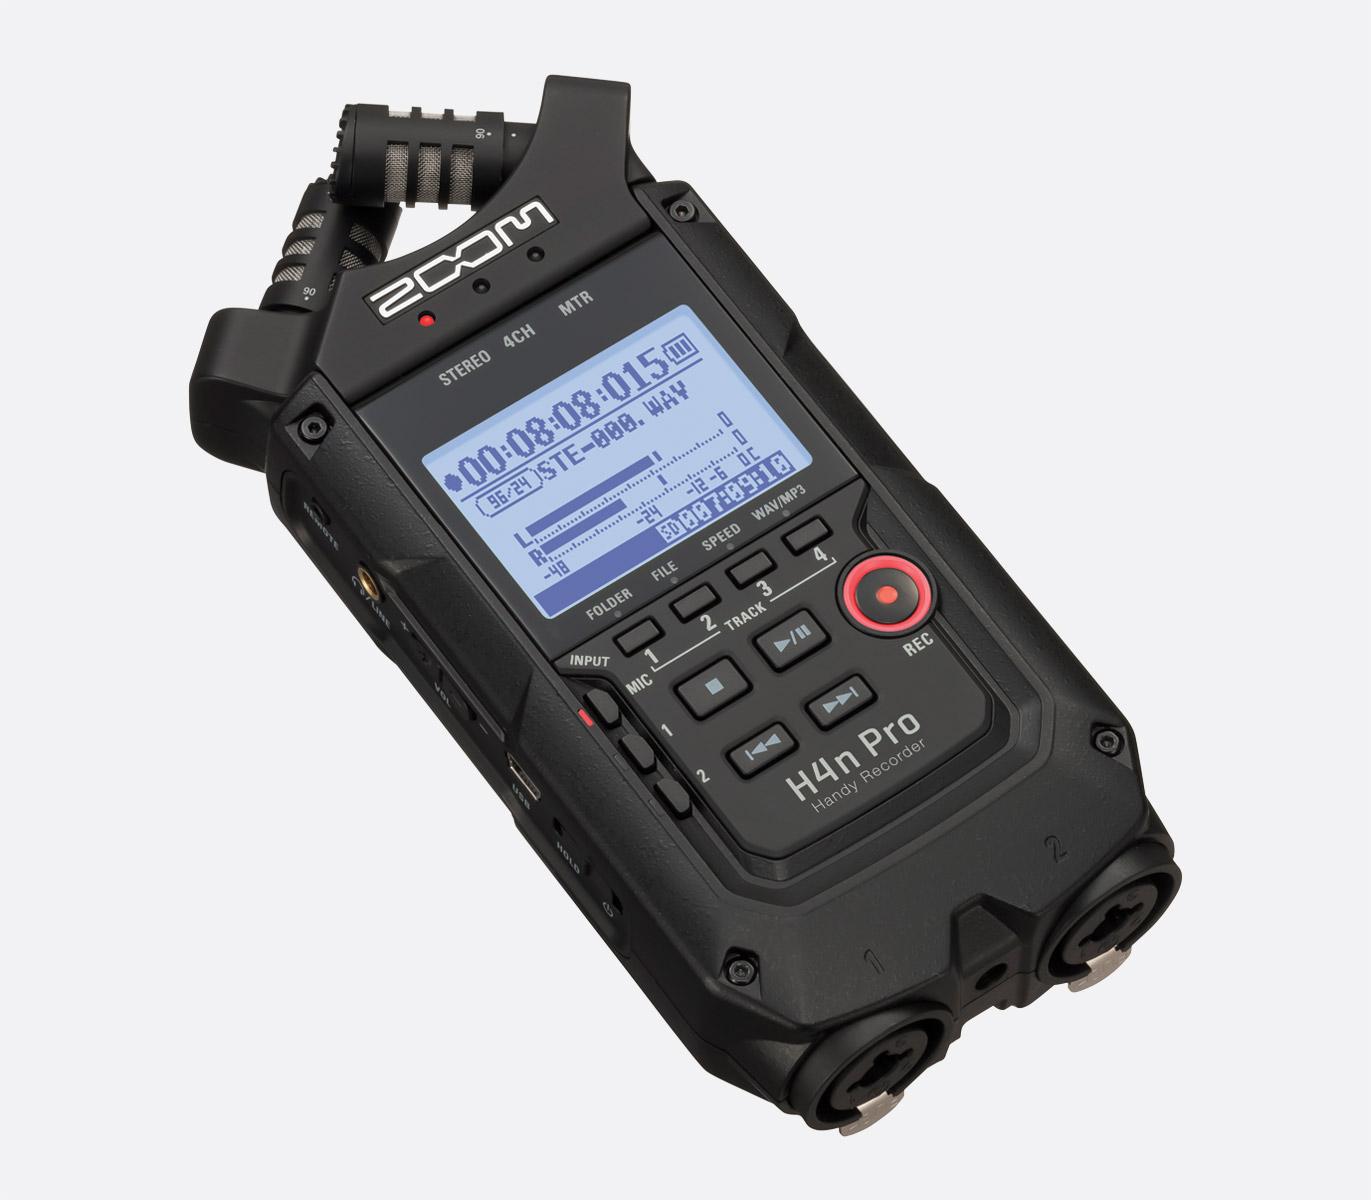 Zoom H4n Pro Handy Recorder Portable Mp3 Wav Sd Sdhc Card X Y